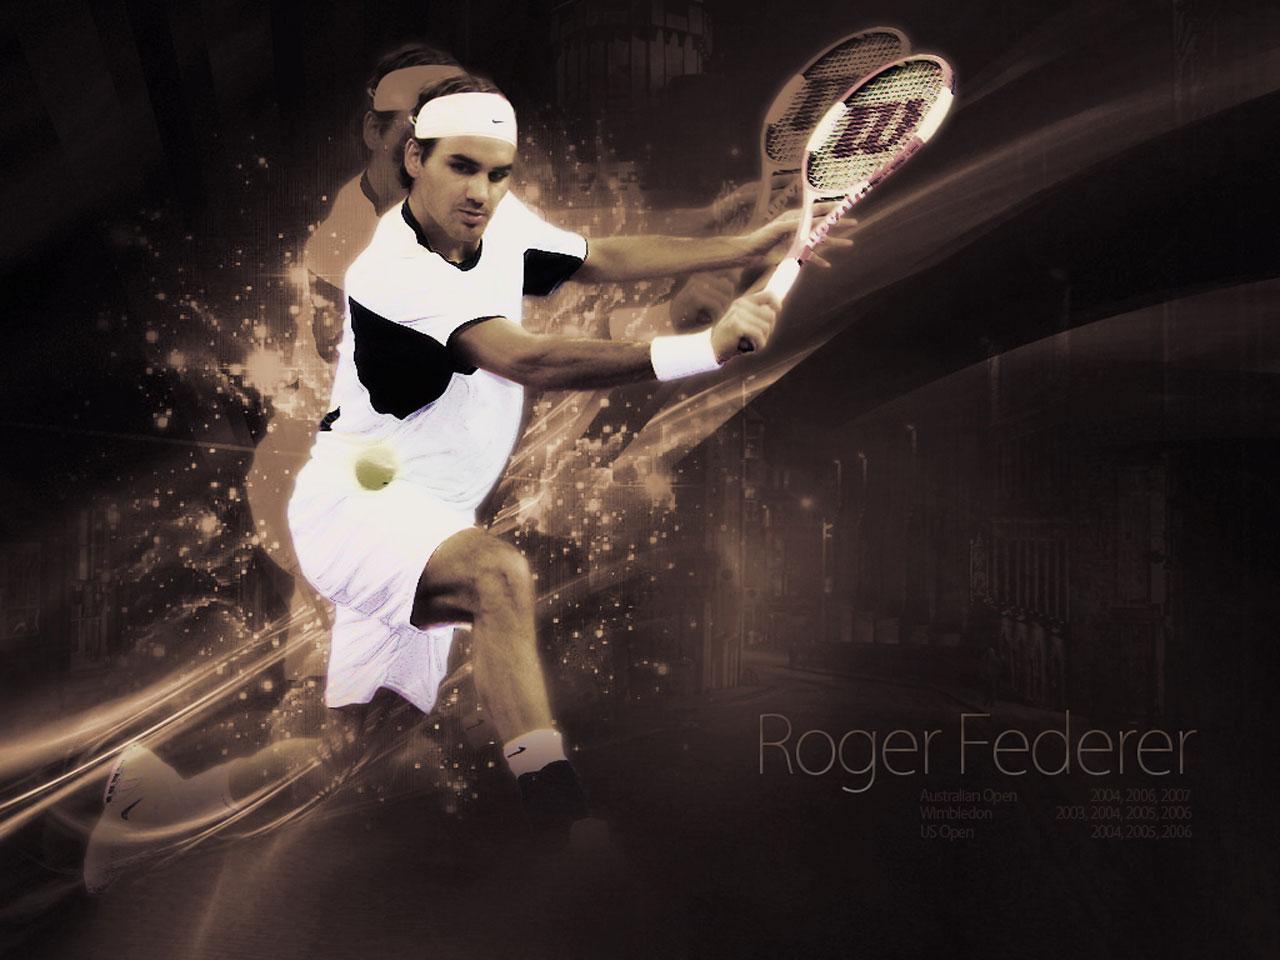 Fond d'écran Roger Federer